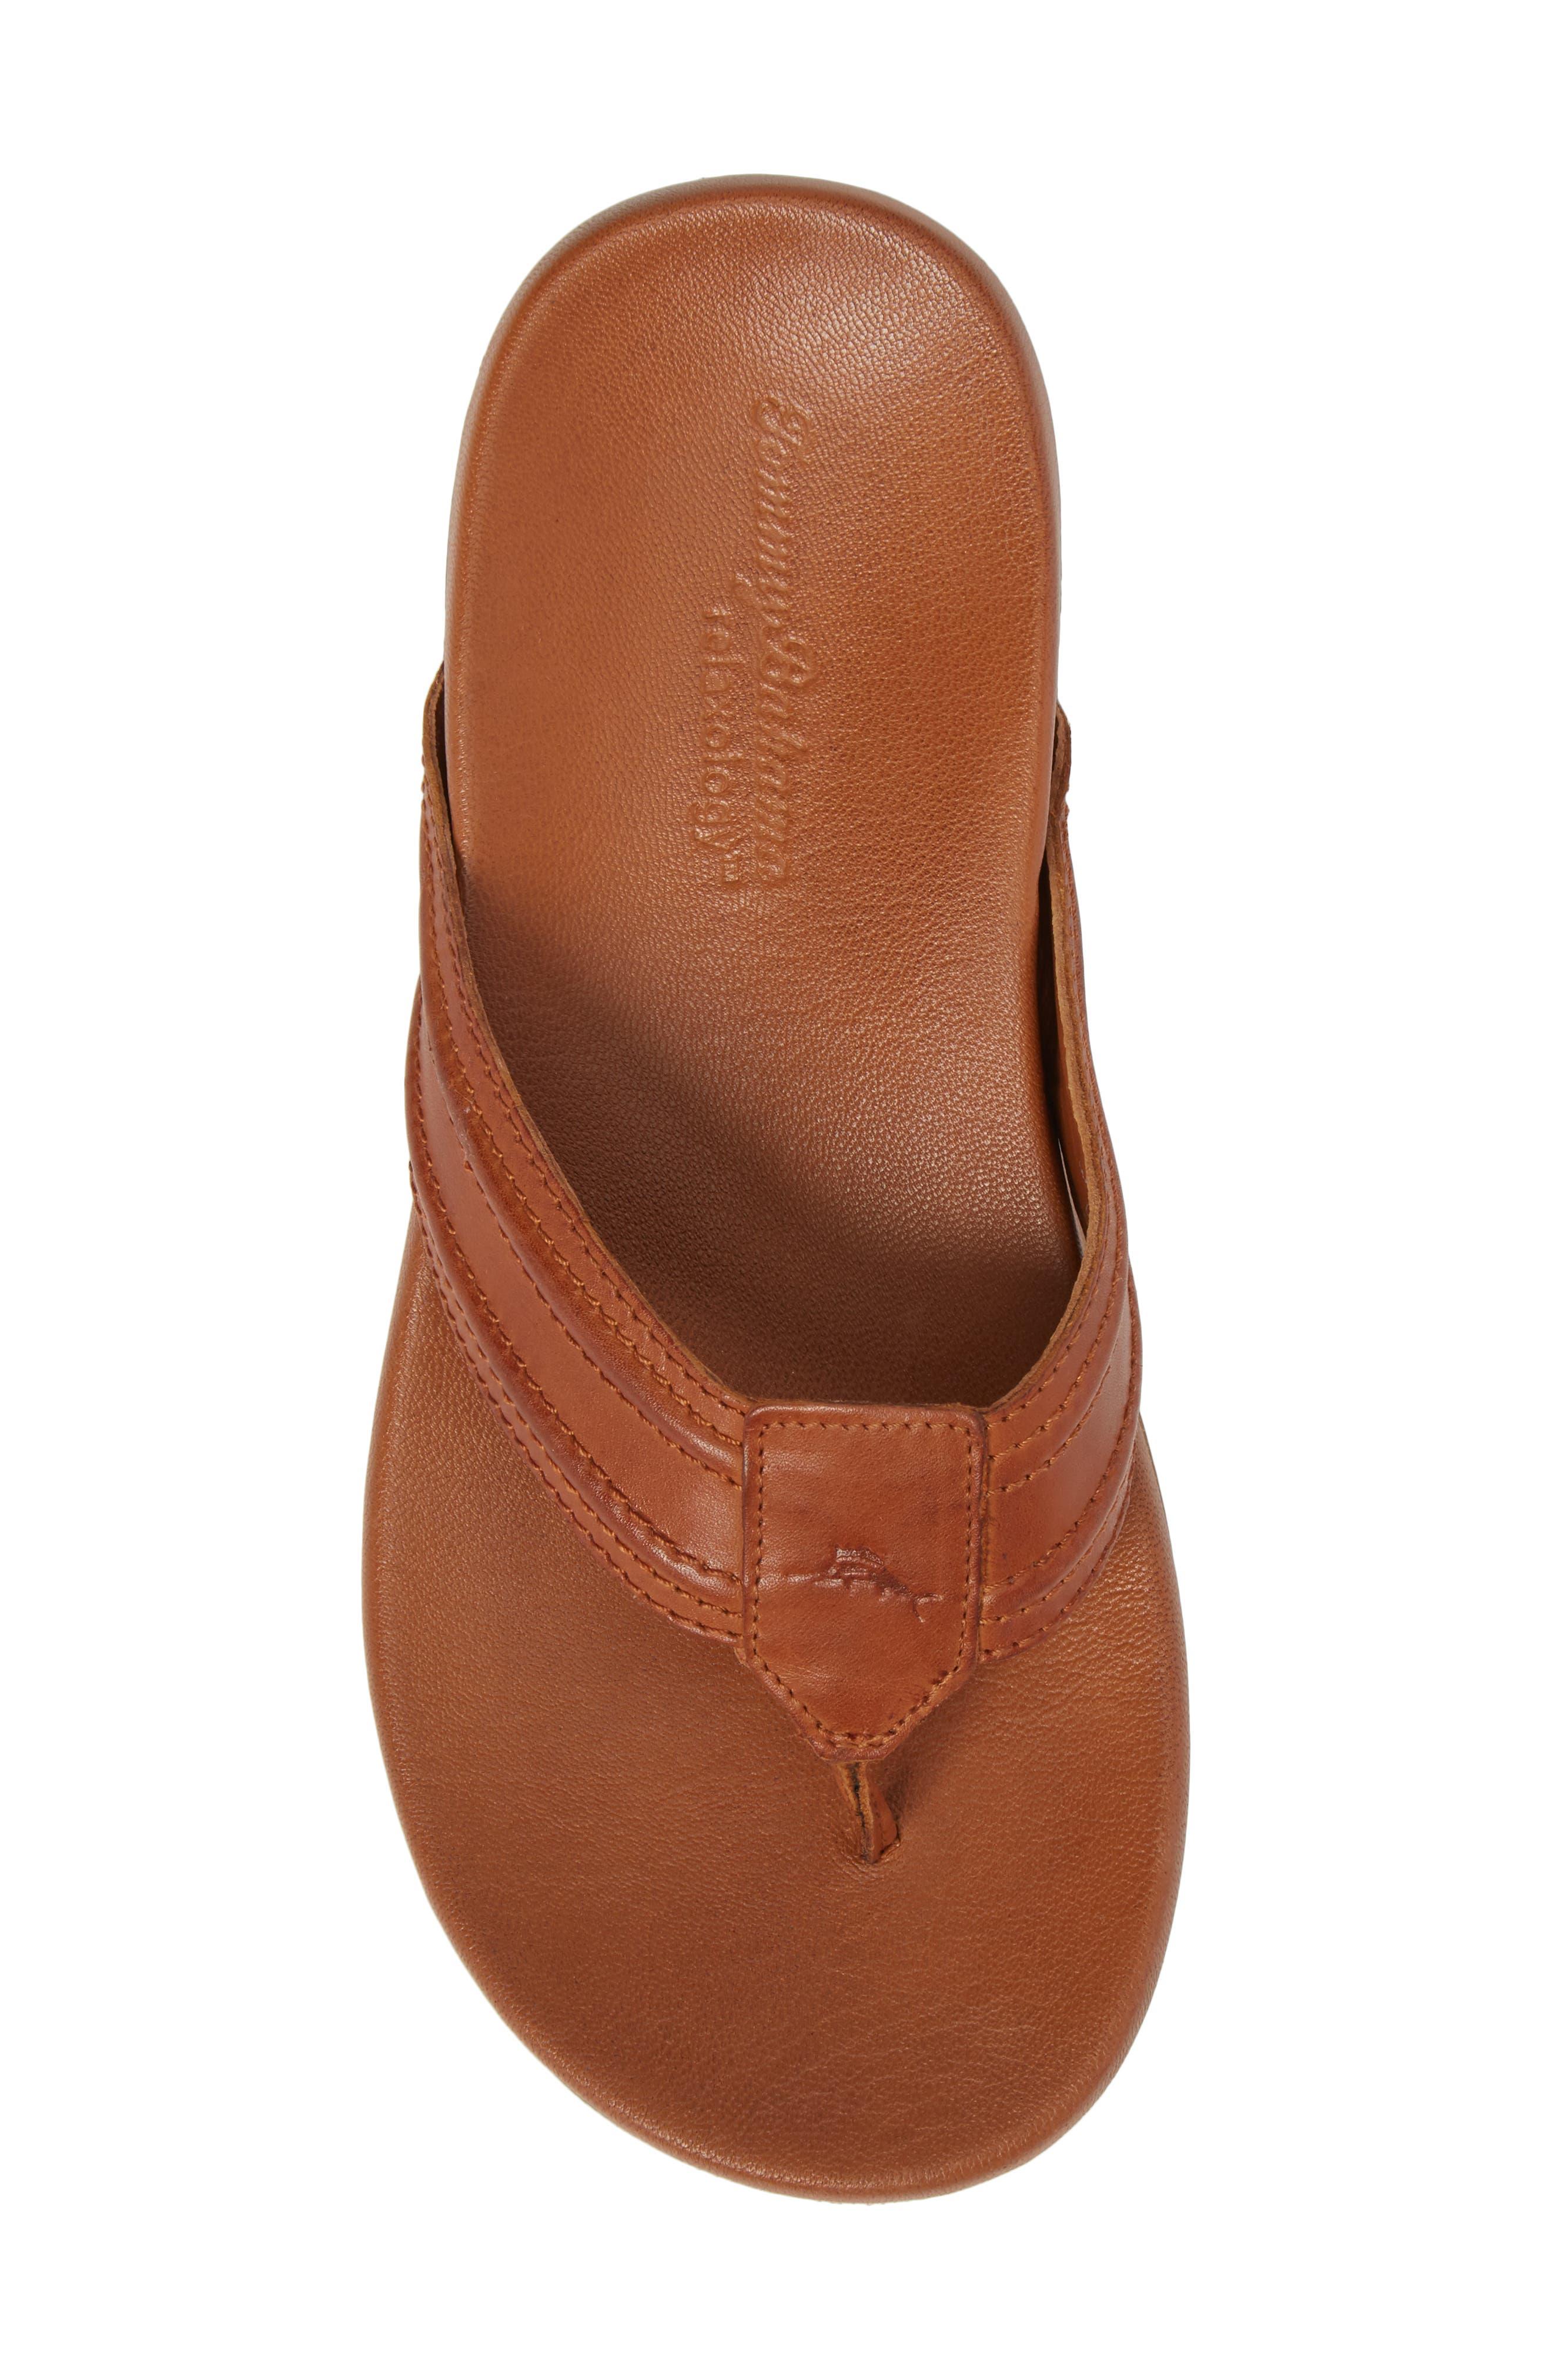 Mayaguana Flip Flop,                             Alternate thumbnail 5, color,                             Tan Leather